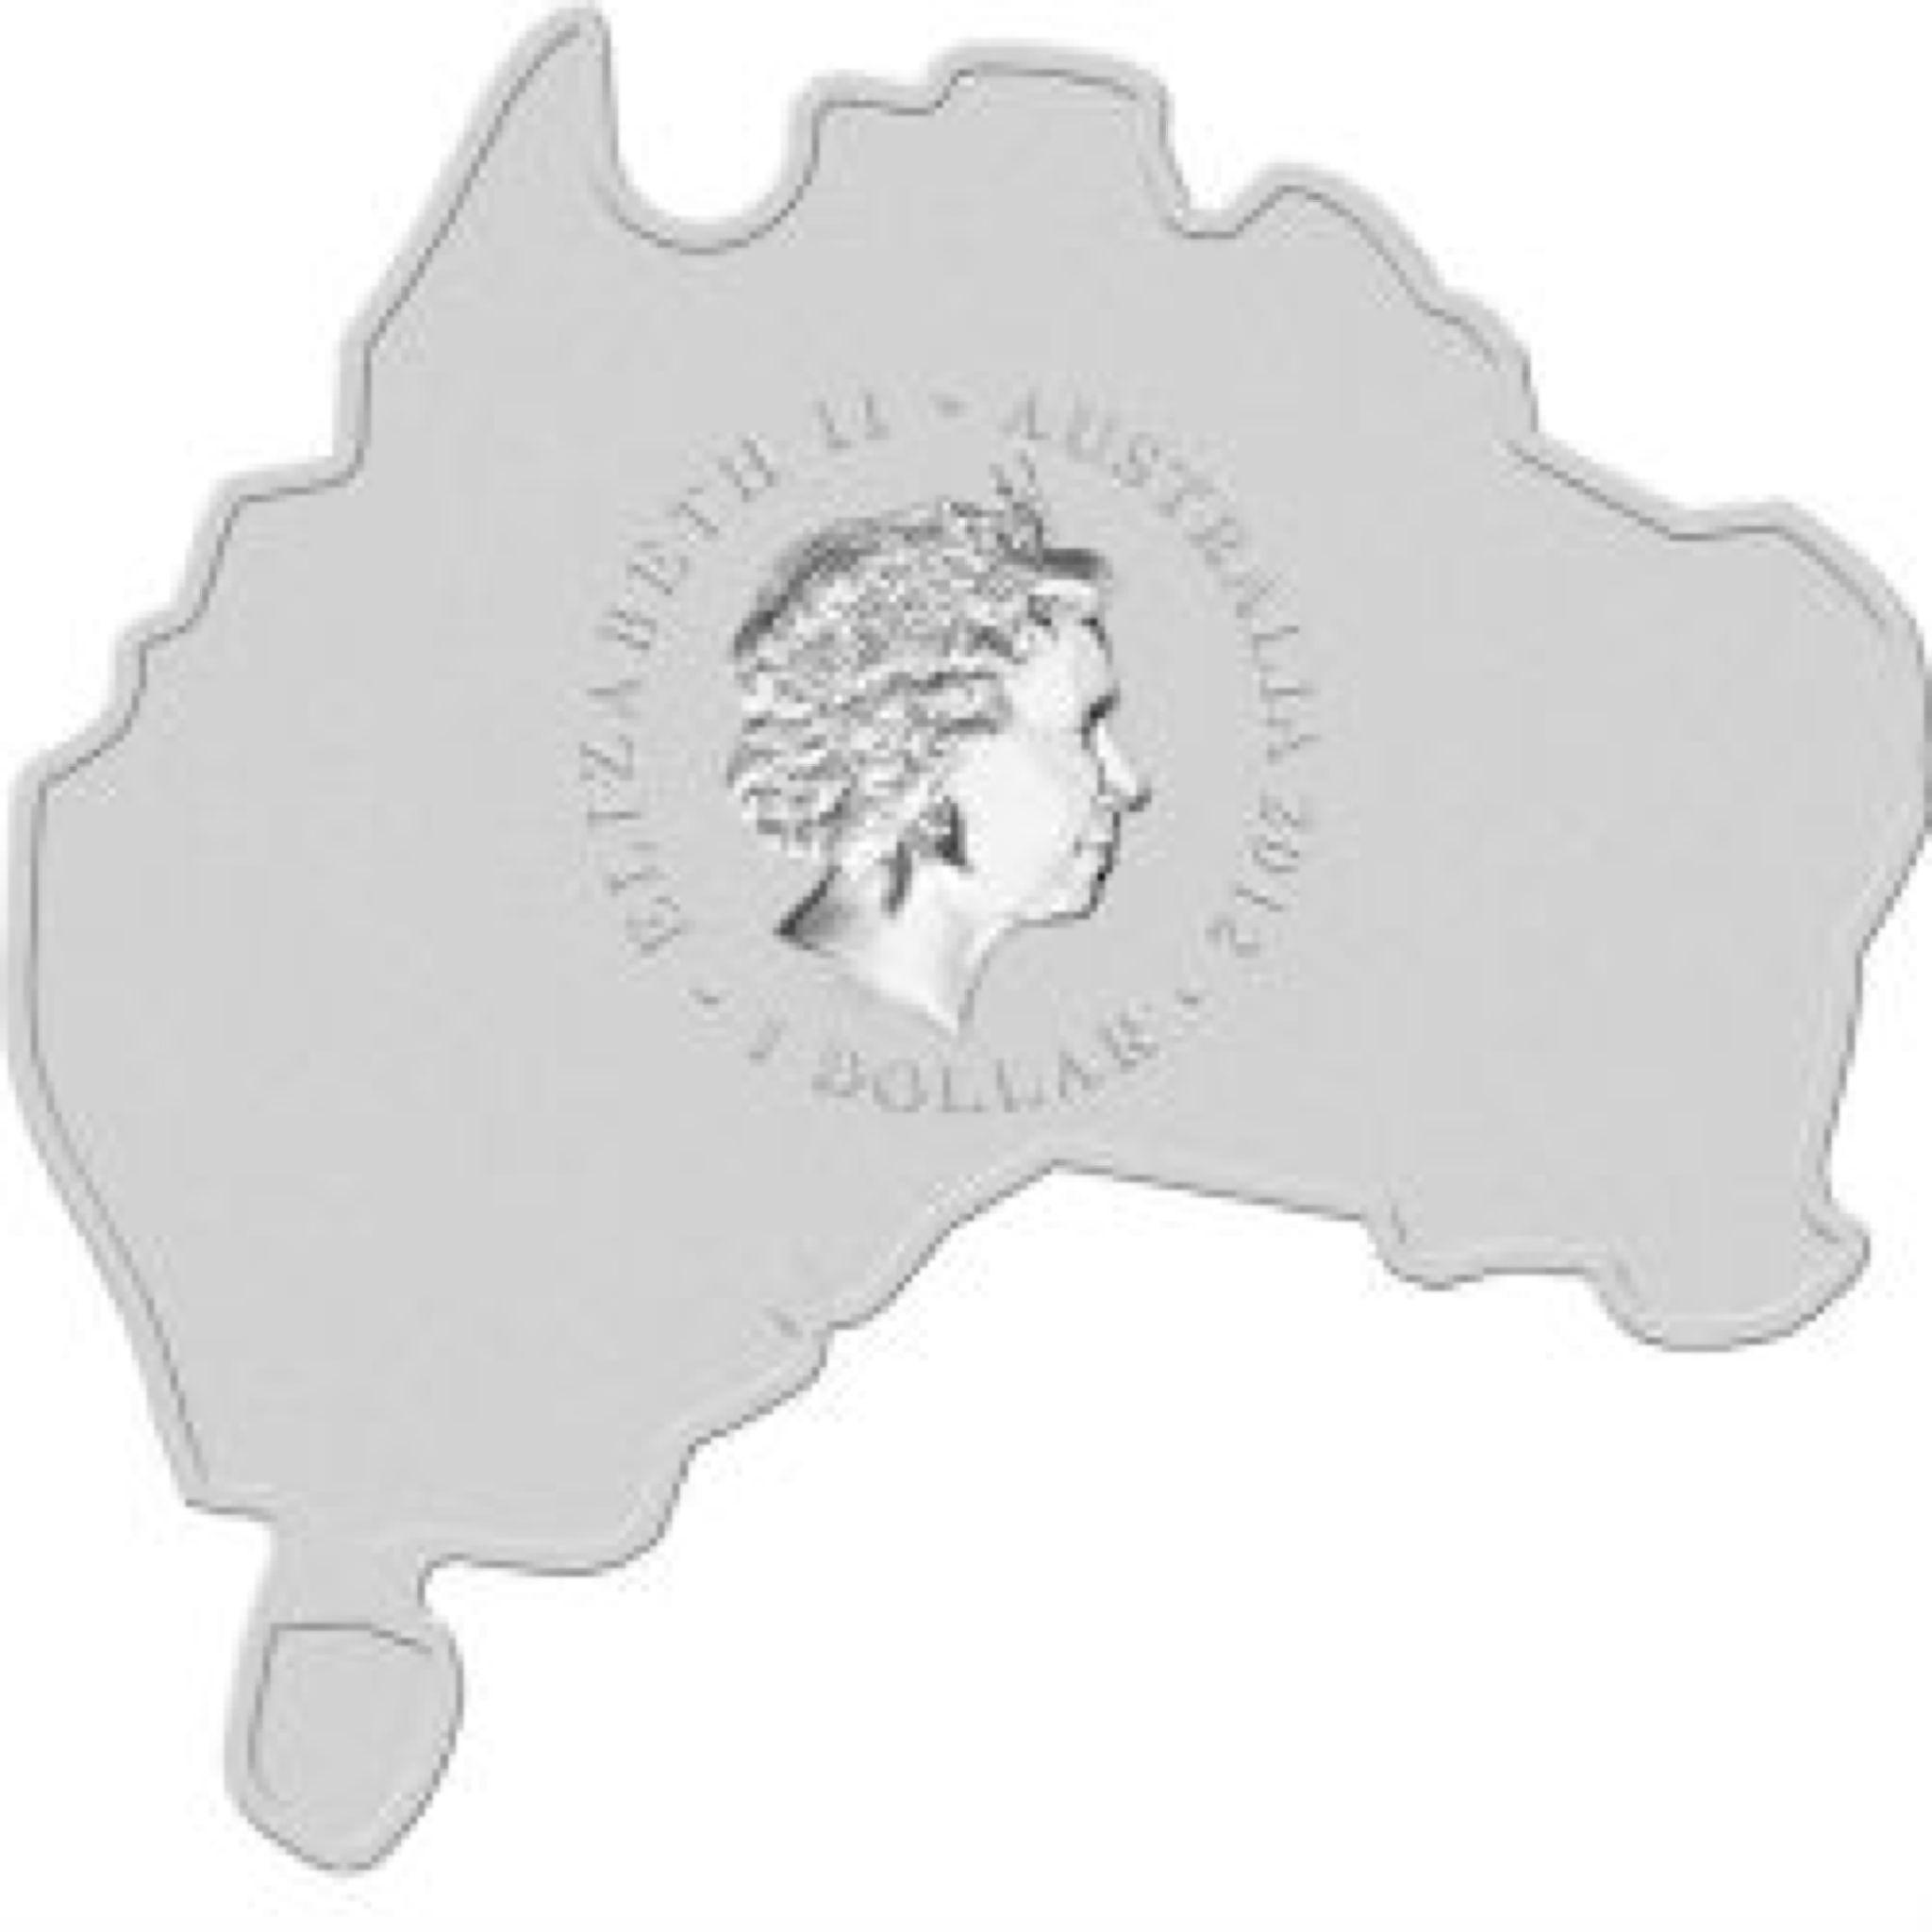 2012 Kookaburra 1oz Map Shape Coin - $1 (2012) back image (back cover, second image)